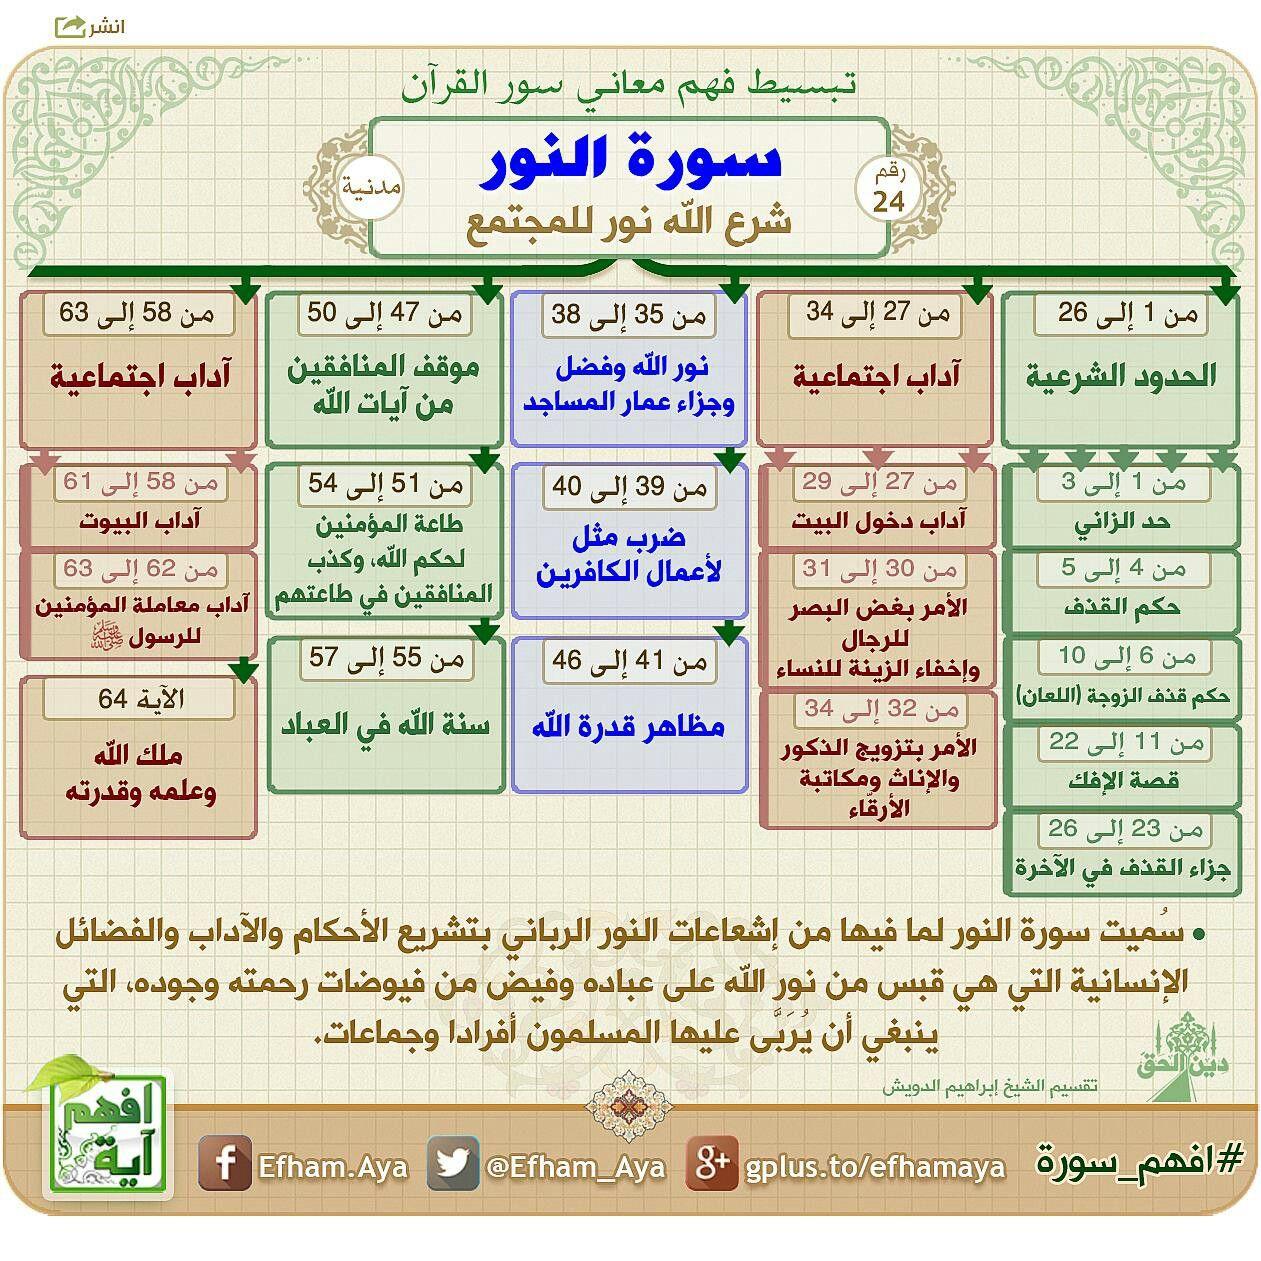 Pin By Fati Guzel On آيات القرآن الكريم Quran Tafseer Quran Book Islam Beliefs